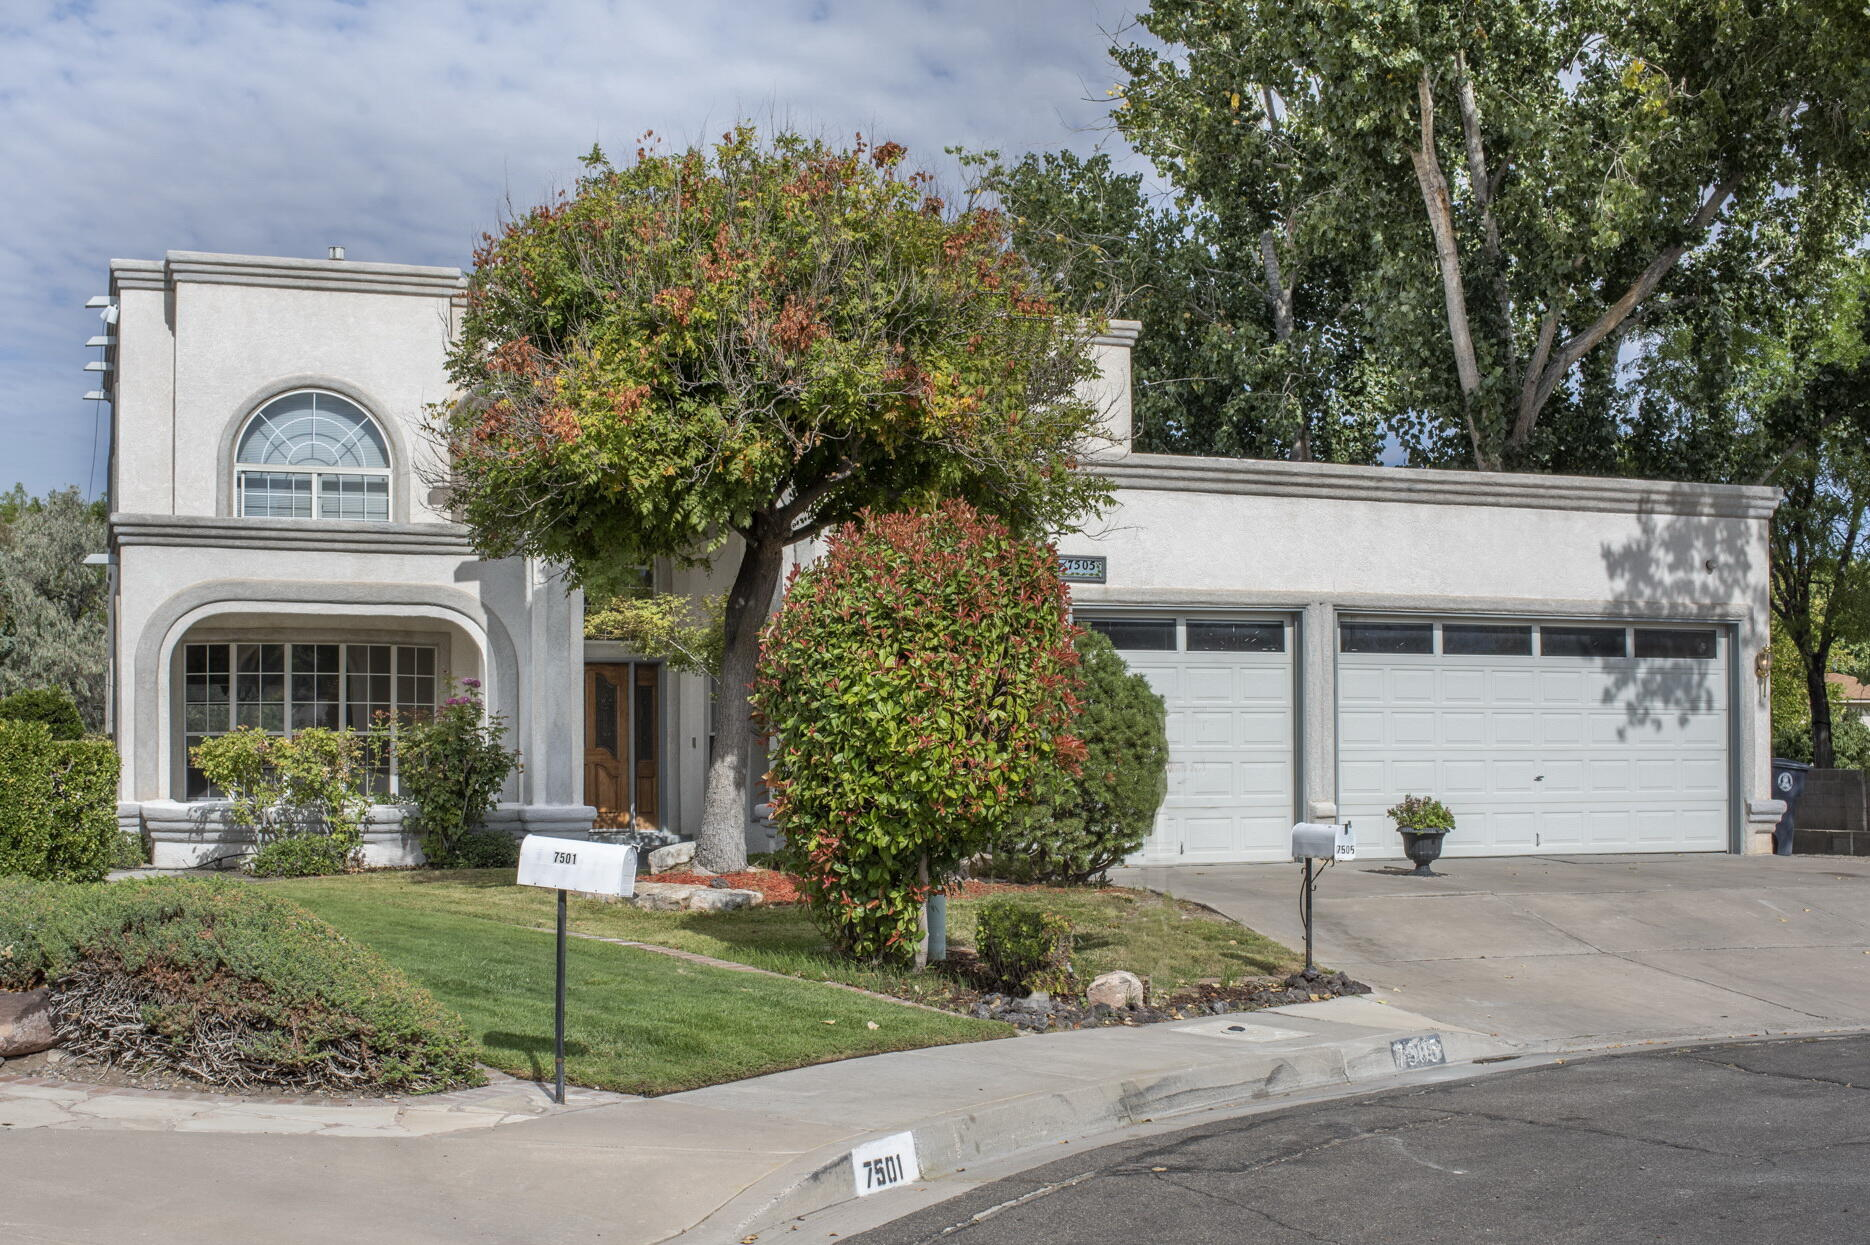 7505 Lew Wallace Drive, Albuquerque NM 87109